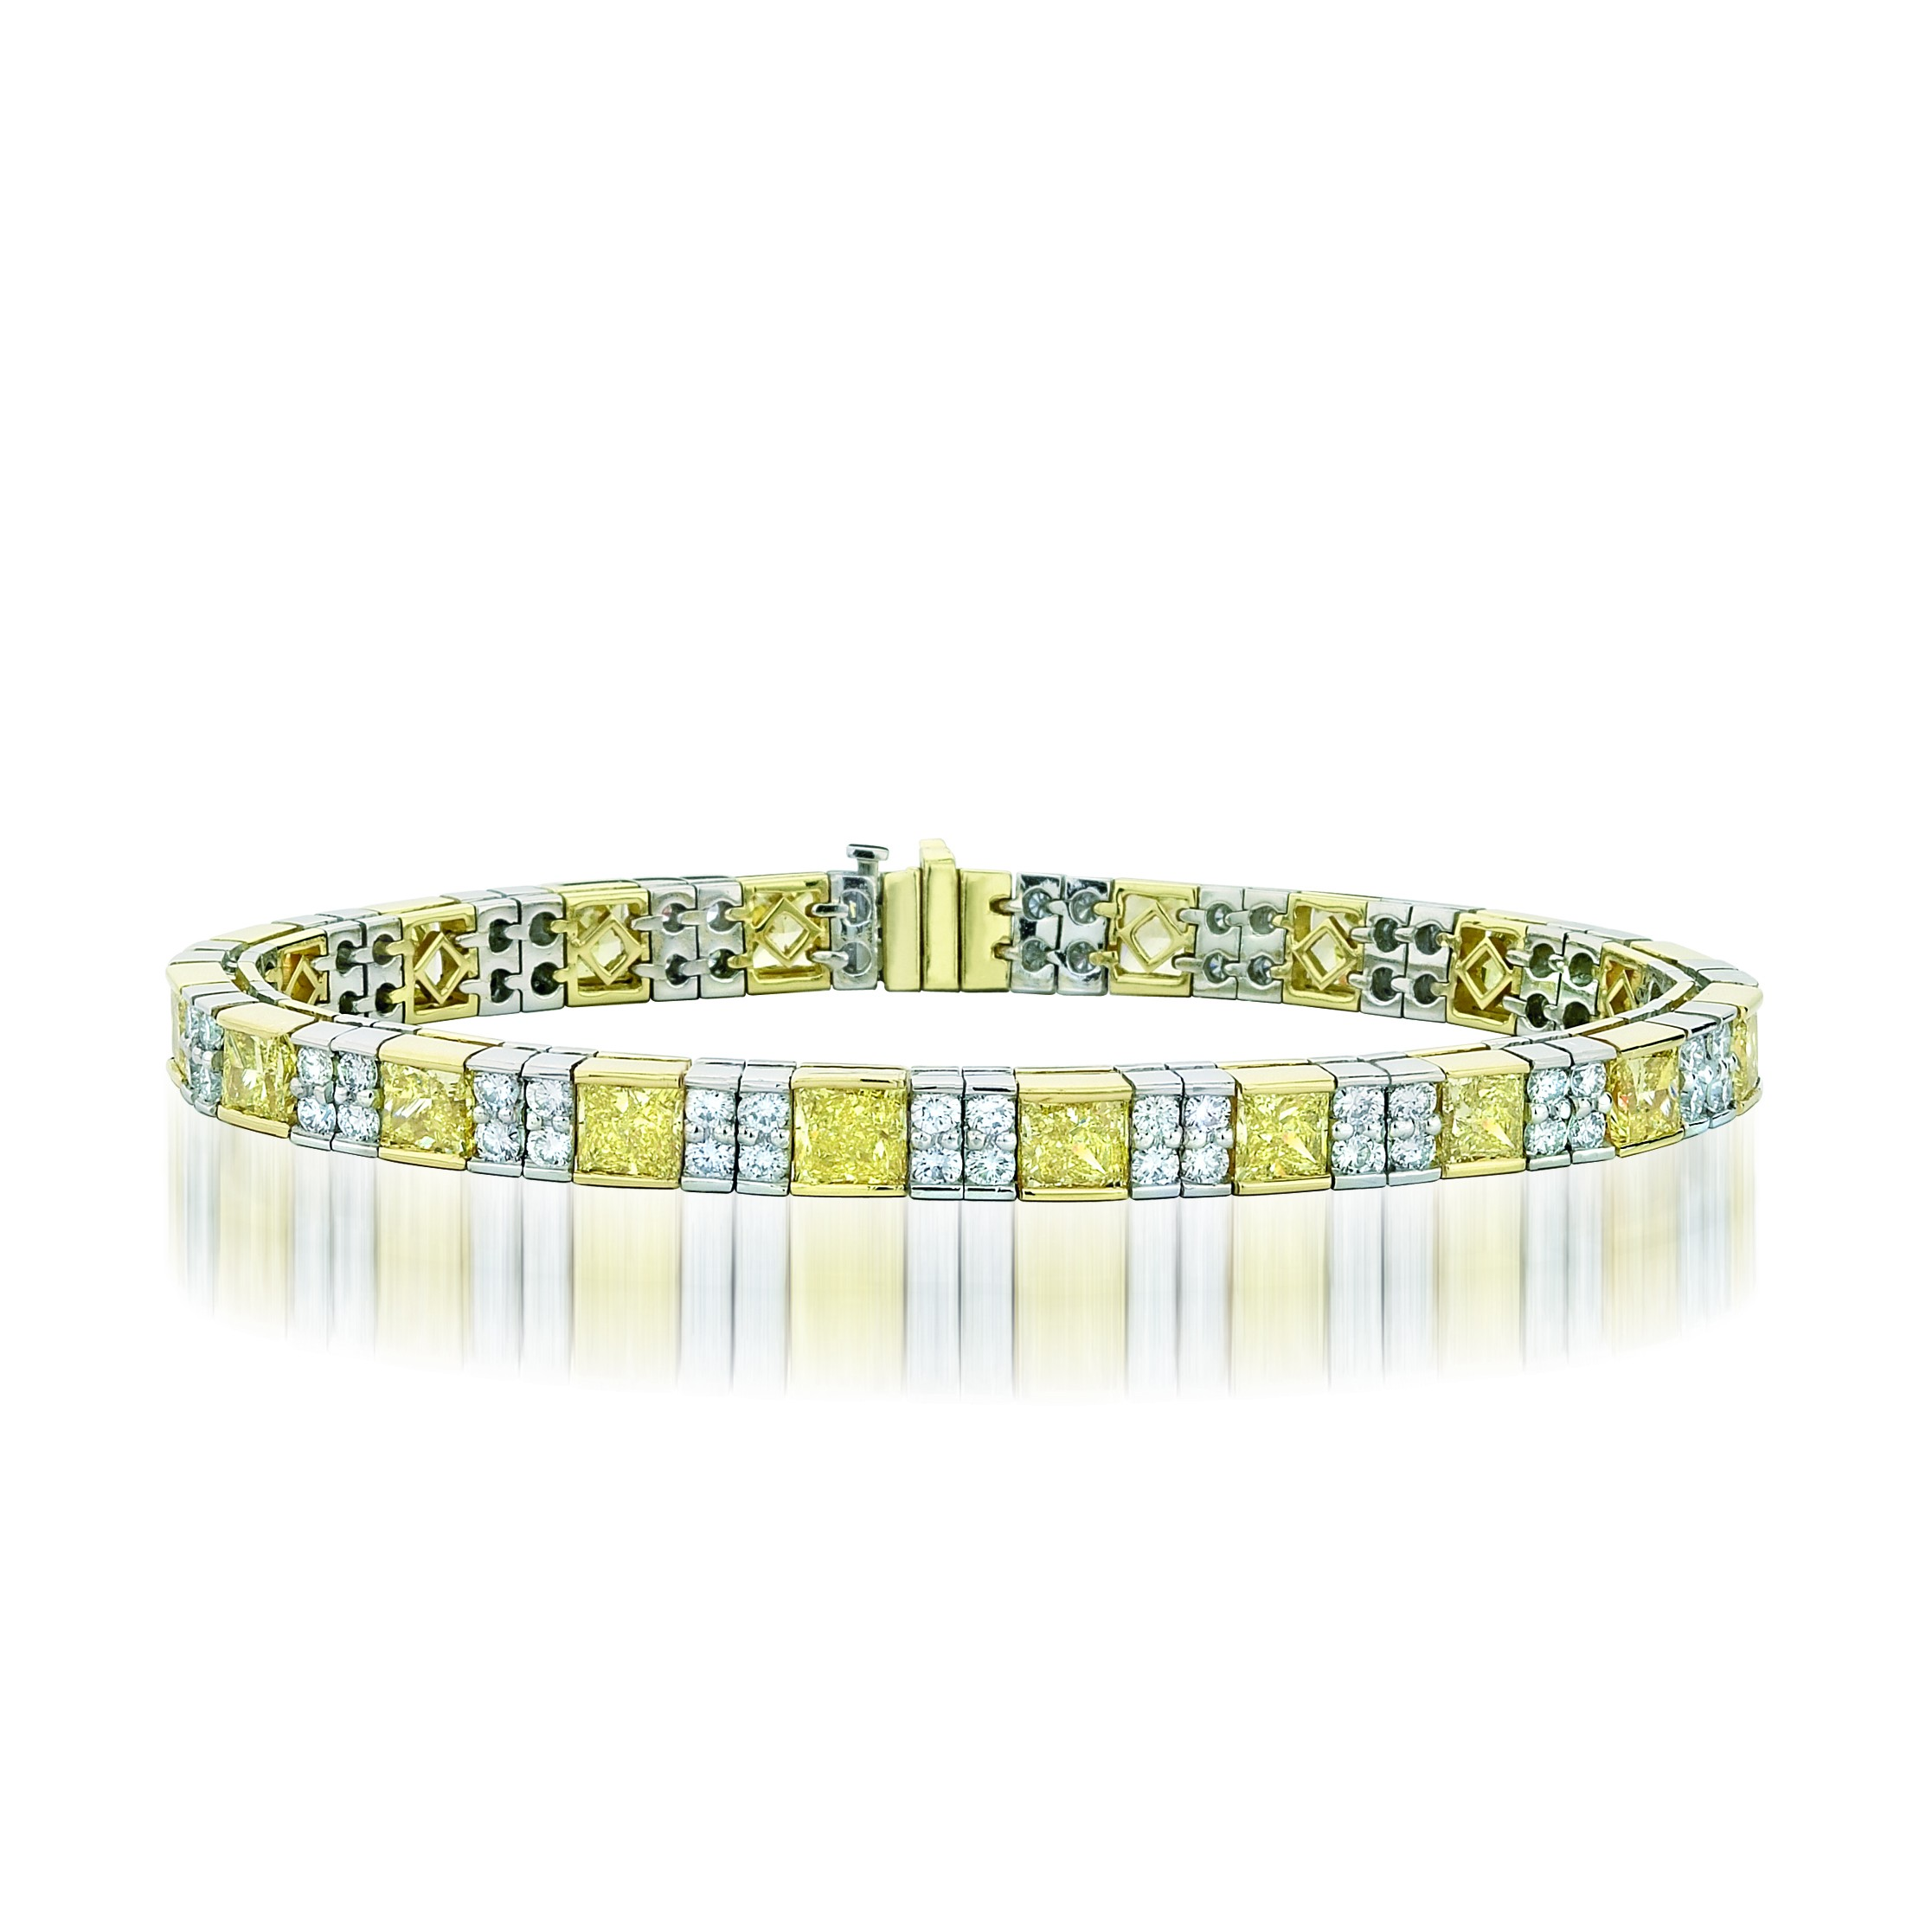 Natureal Collection Platinum Princess-Cut Fancy Yellow Diamond Bracelet LBR027